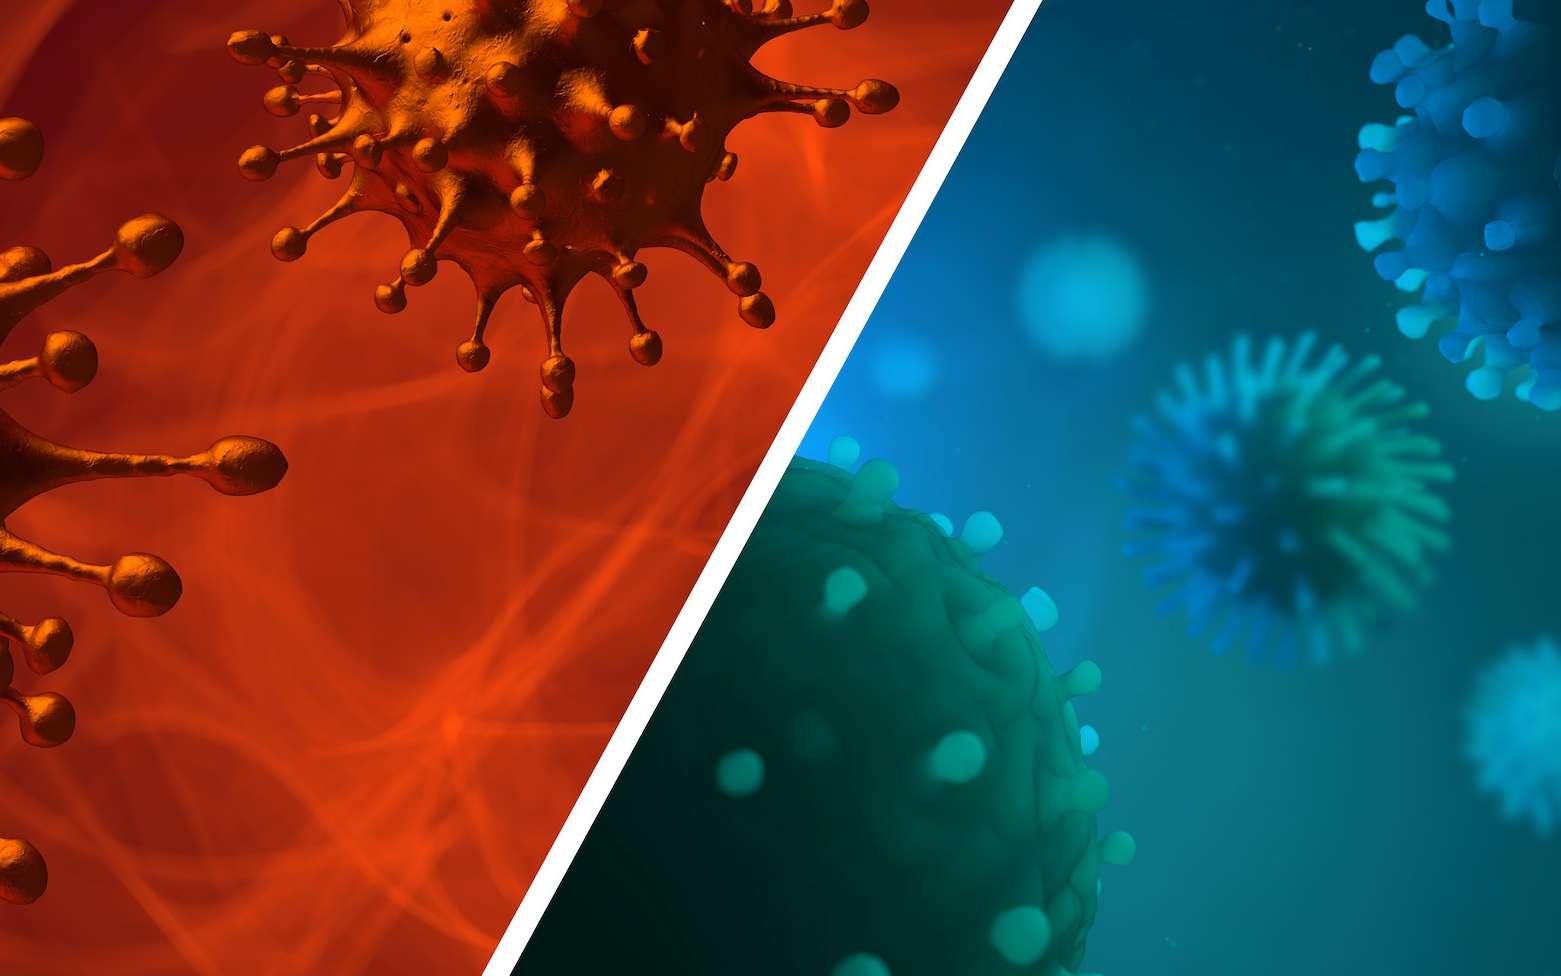 Comparaison entre la grippe et la coronavirus. © CROCOTHERY, Adobe Stock